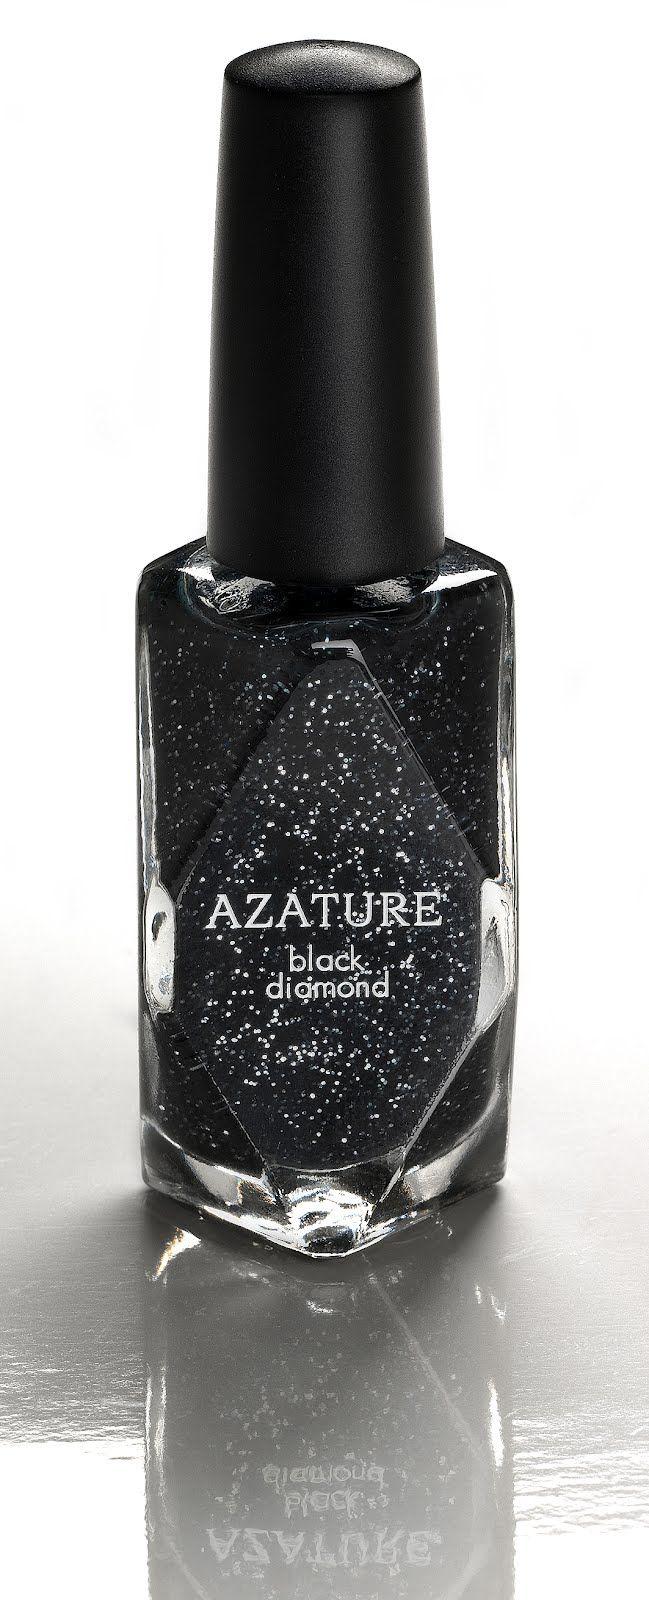 $250,000 Most Expensive Polish in the World: Azature Black Diamond Nail Polish